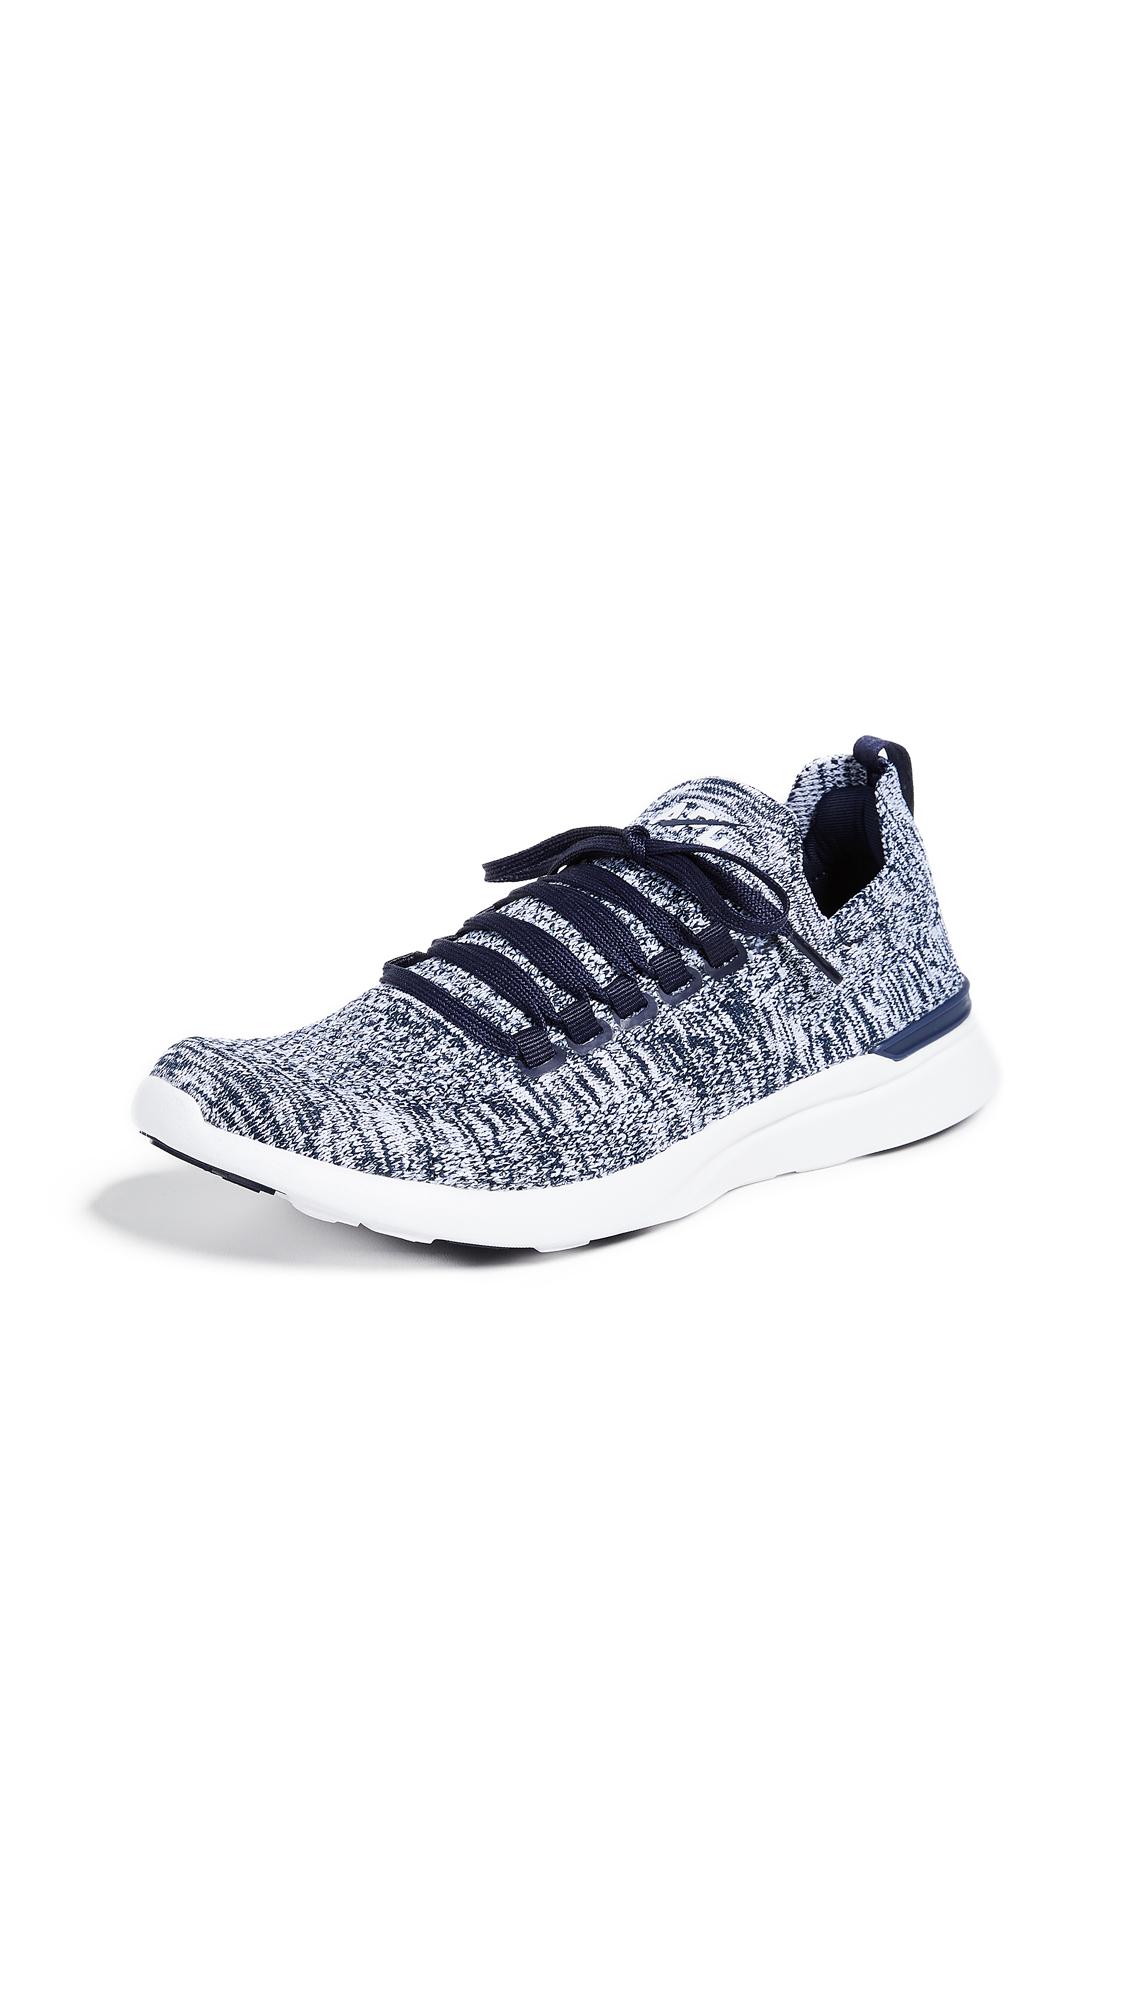 APL: Athletic Propulsion Labs TechLoom Breeze Sneakers - Navy/White Melange